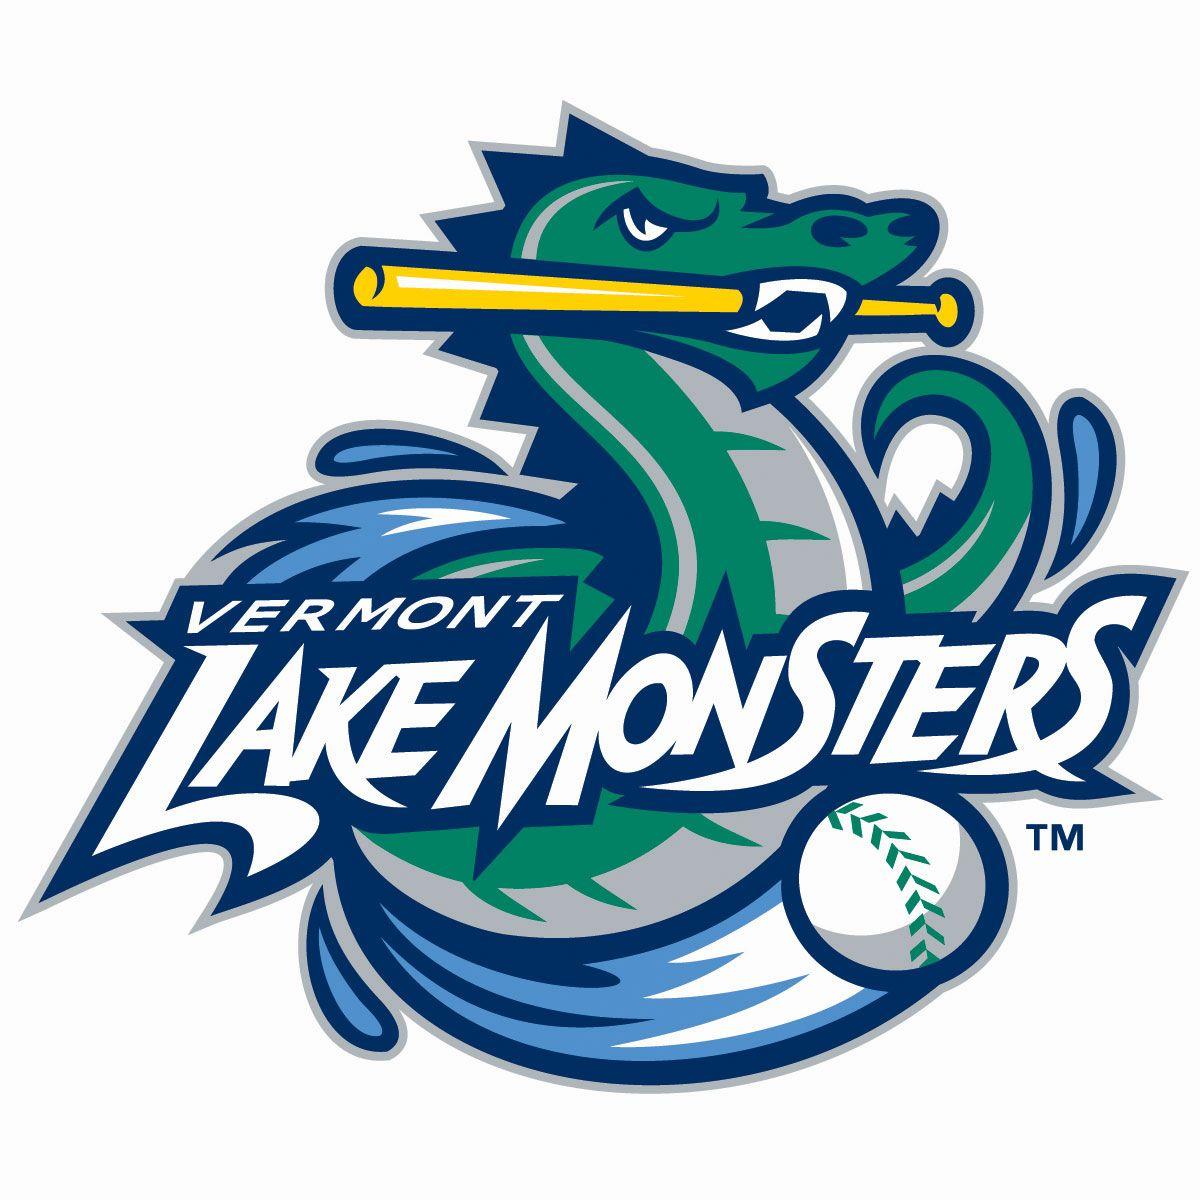 Pin By Brent Fox On Logo Design 1 Baseball Teams Logo Minor League Baseball Best Team Names